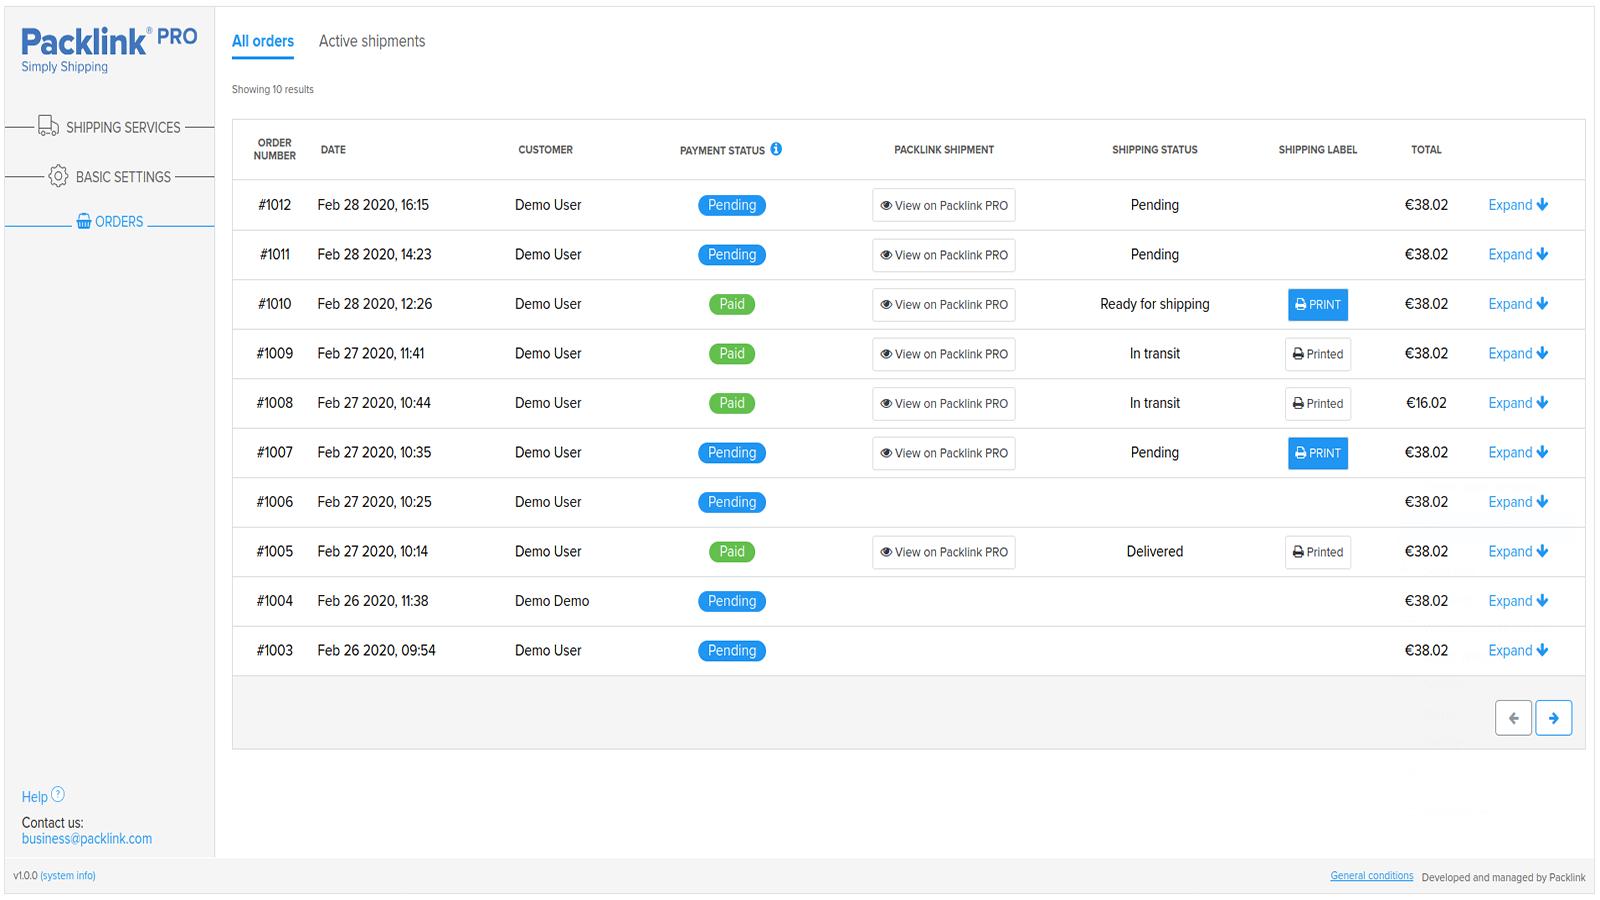 Packlink PRO Shipping App